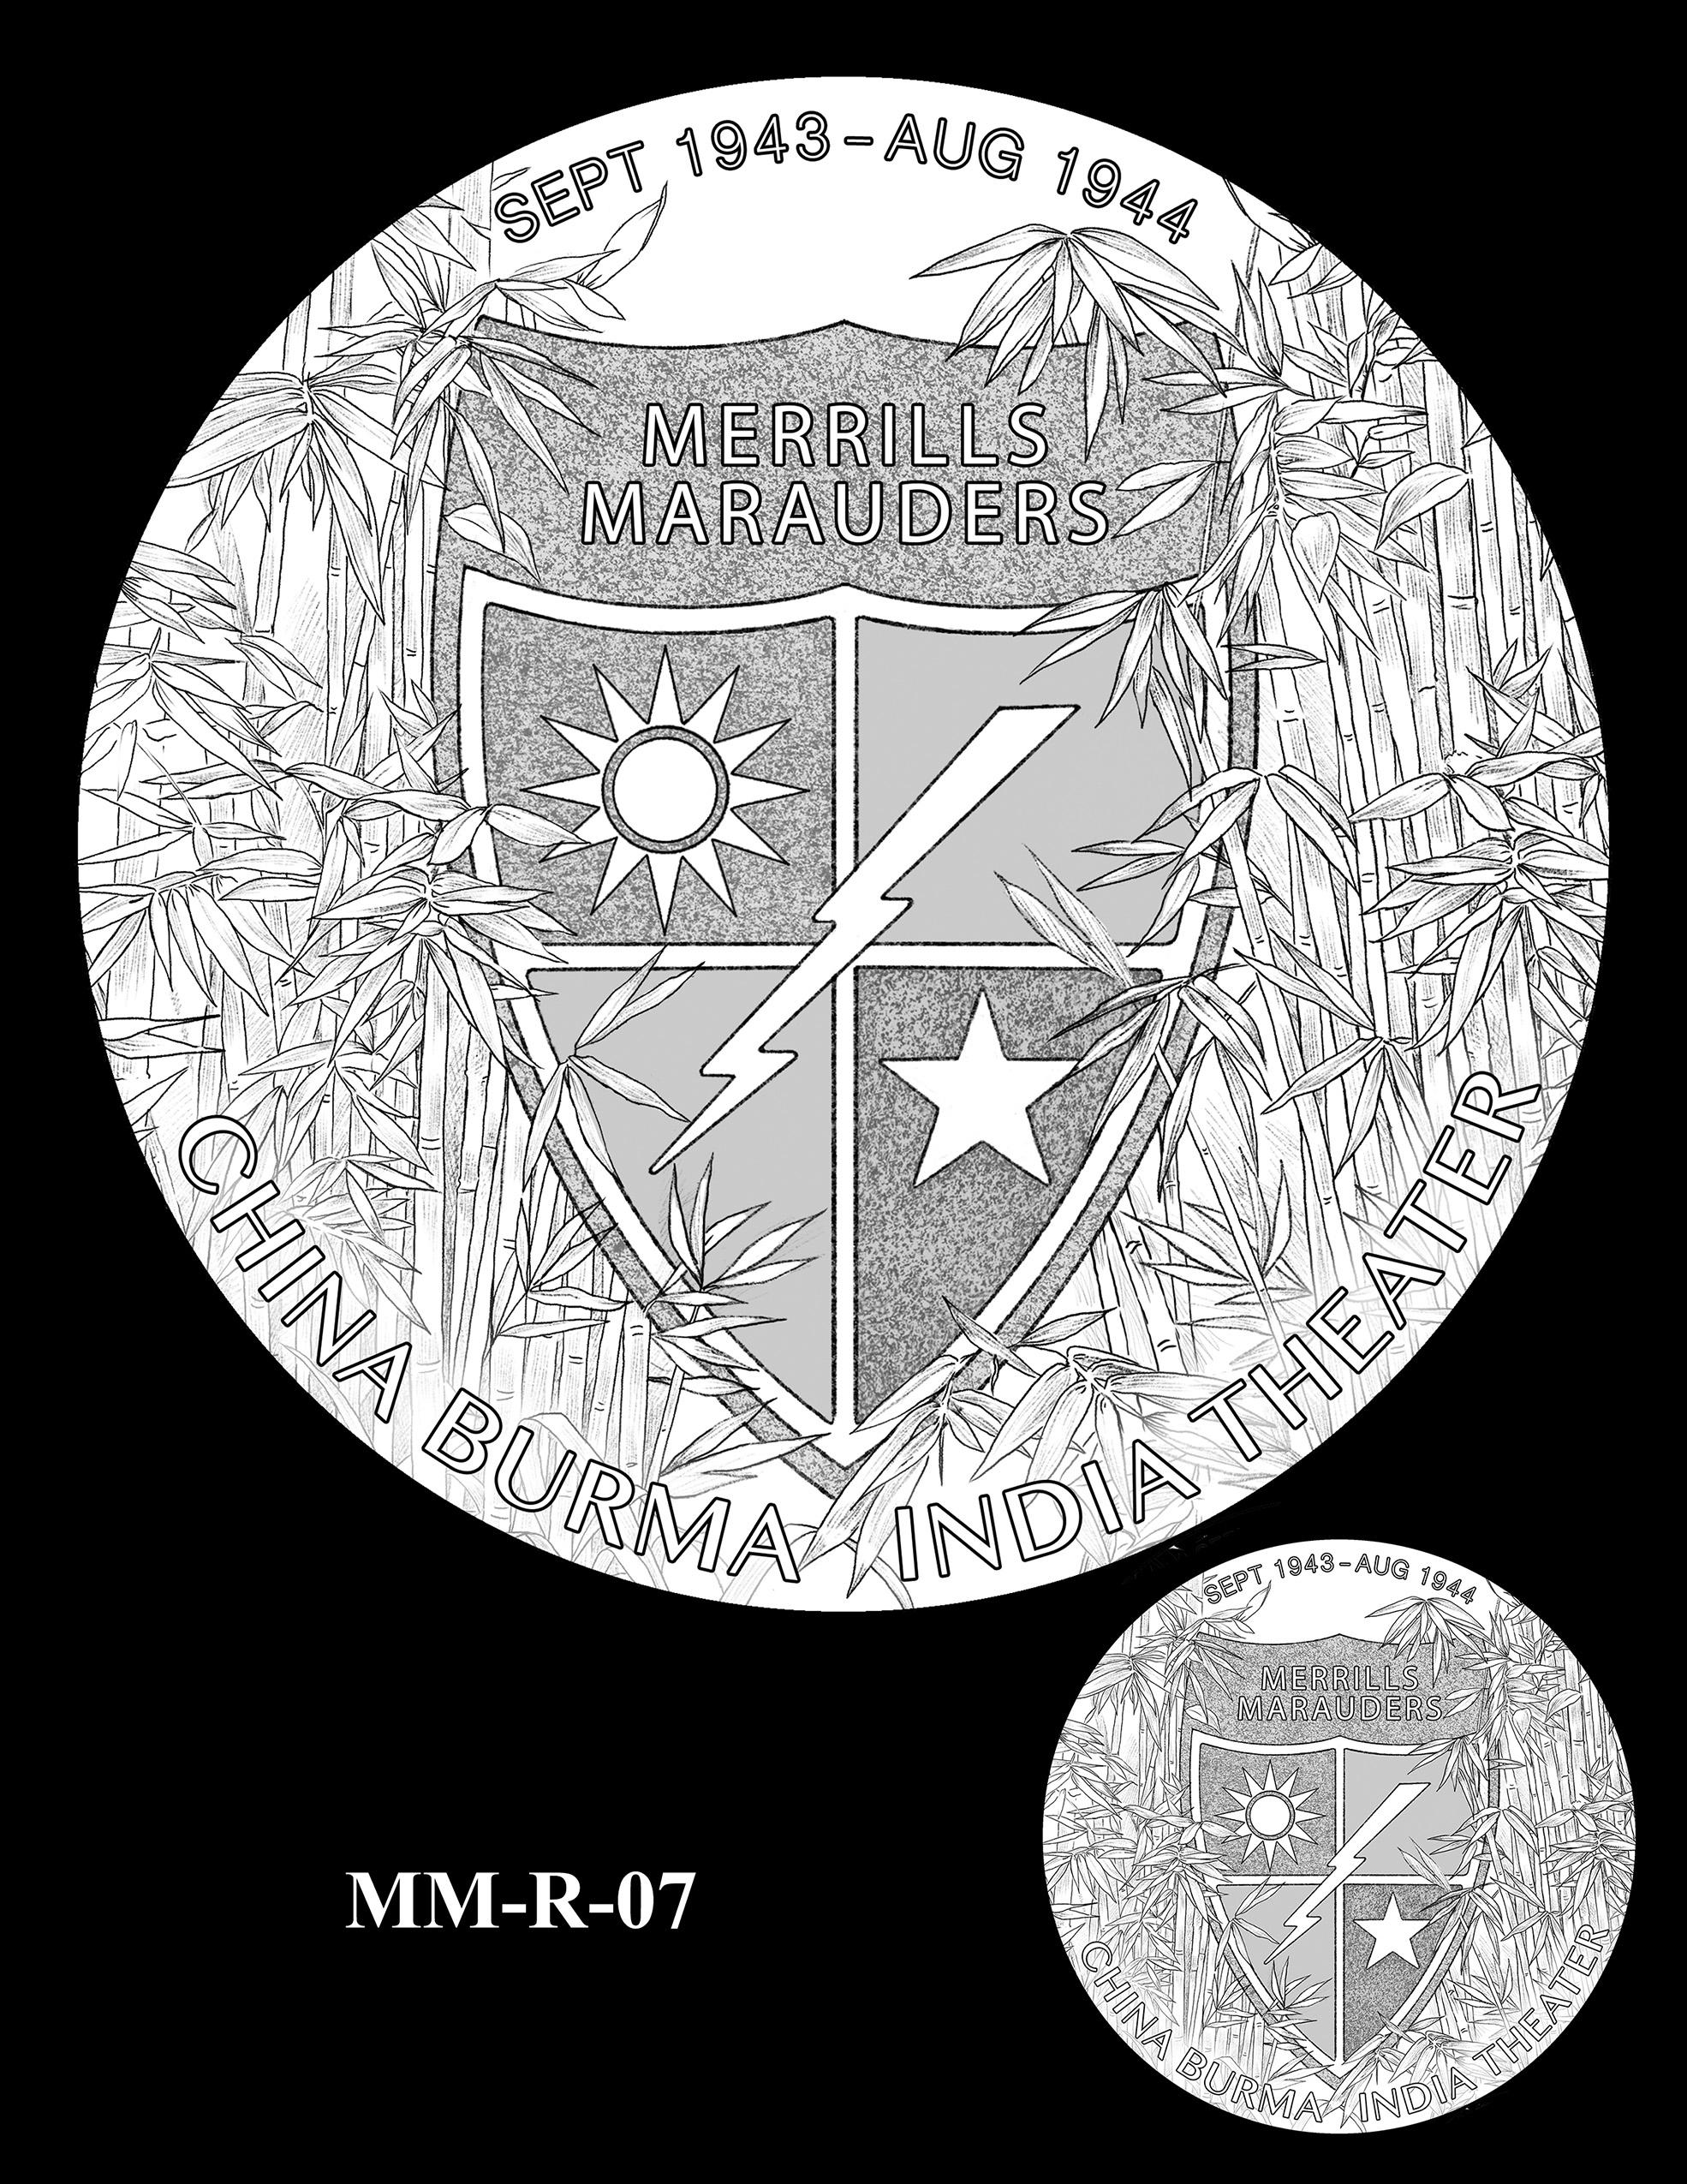 MM-R-07 -- Merrill's Marauders Congressional Gold Medal